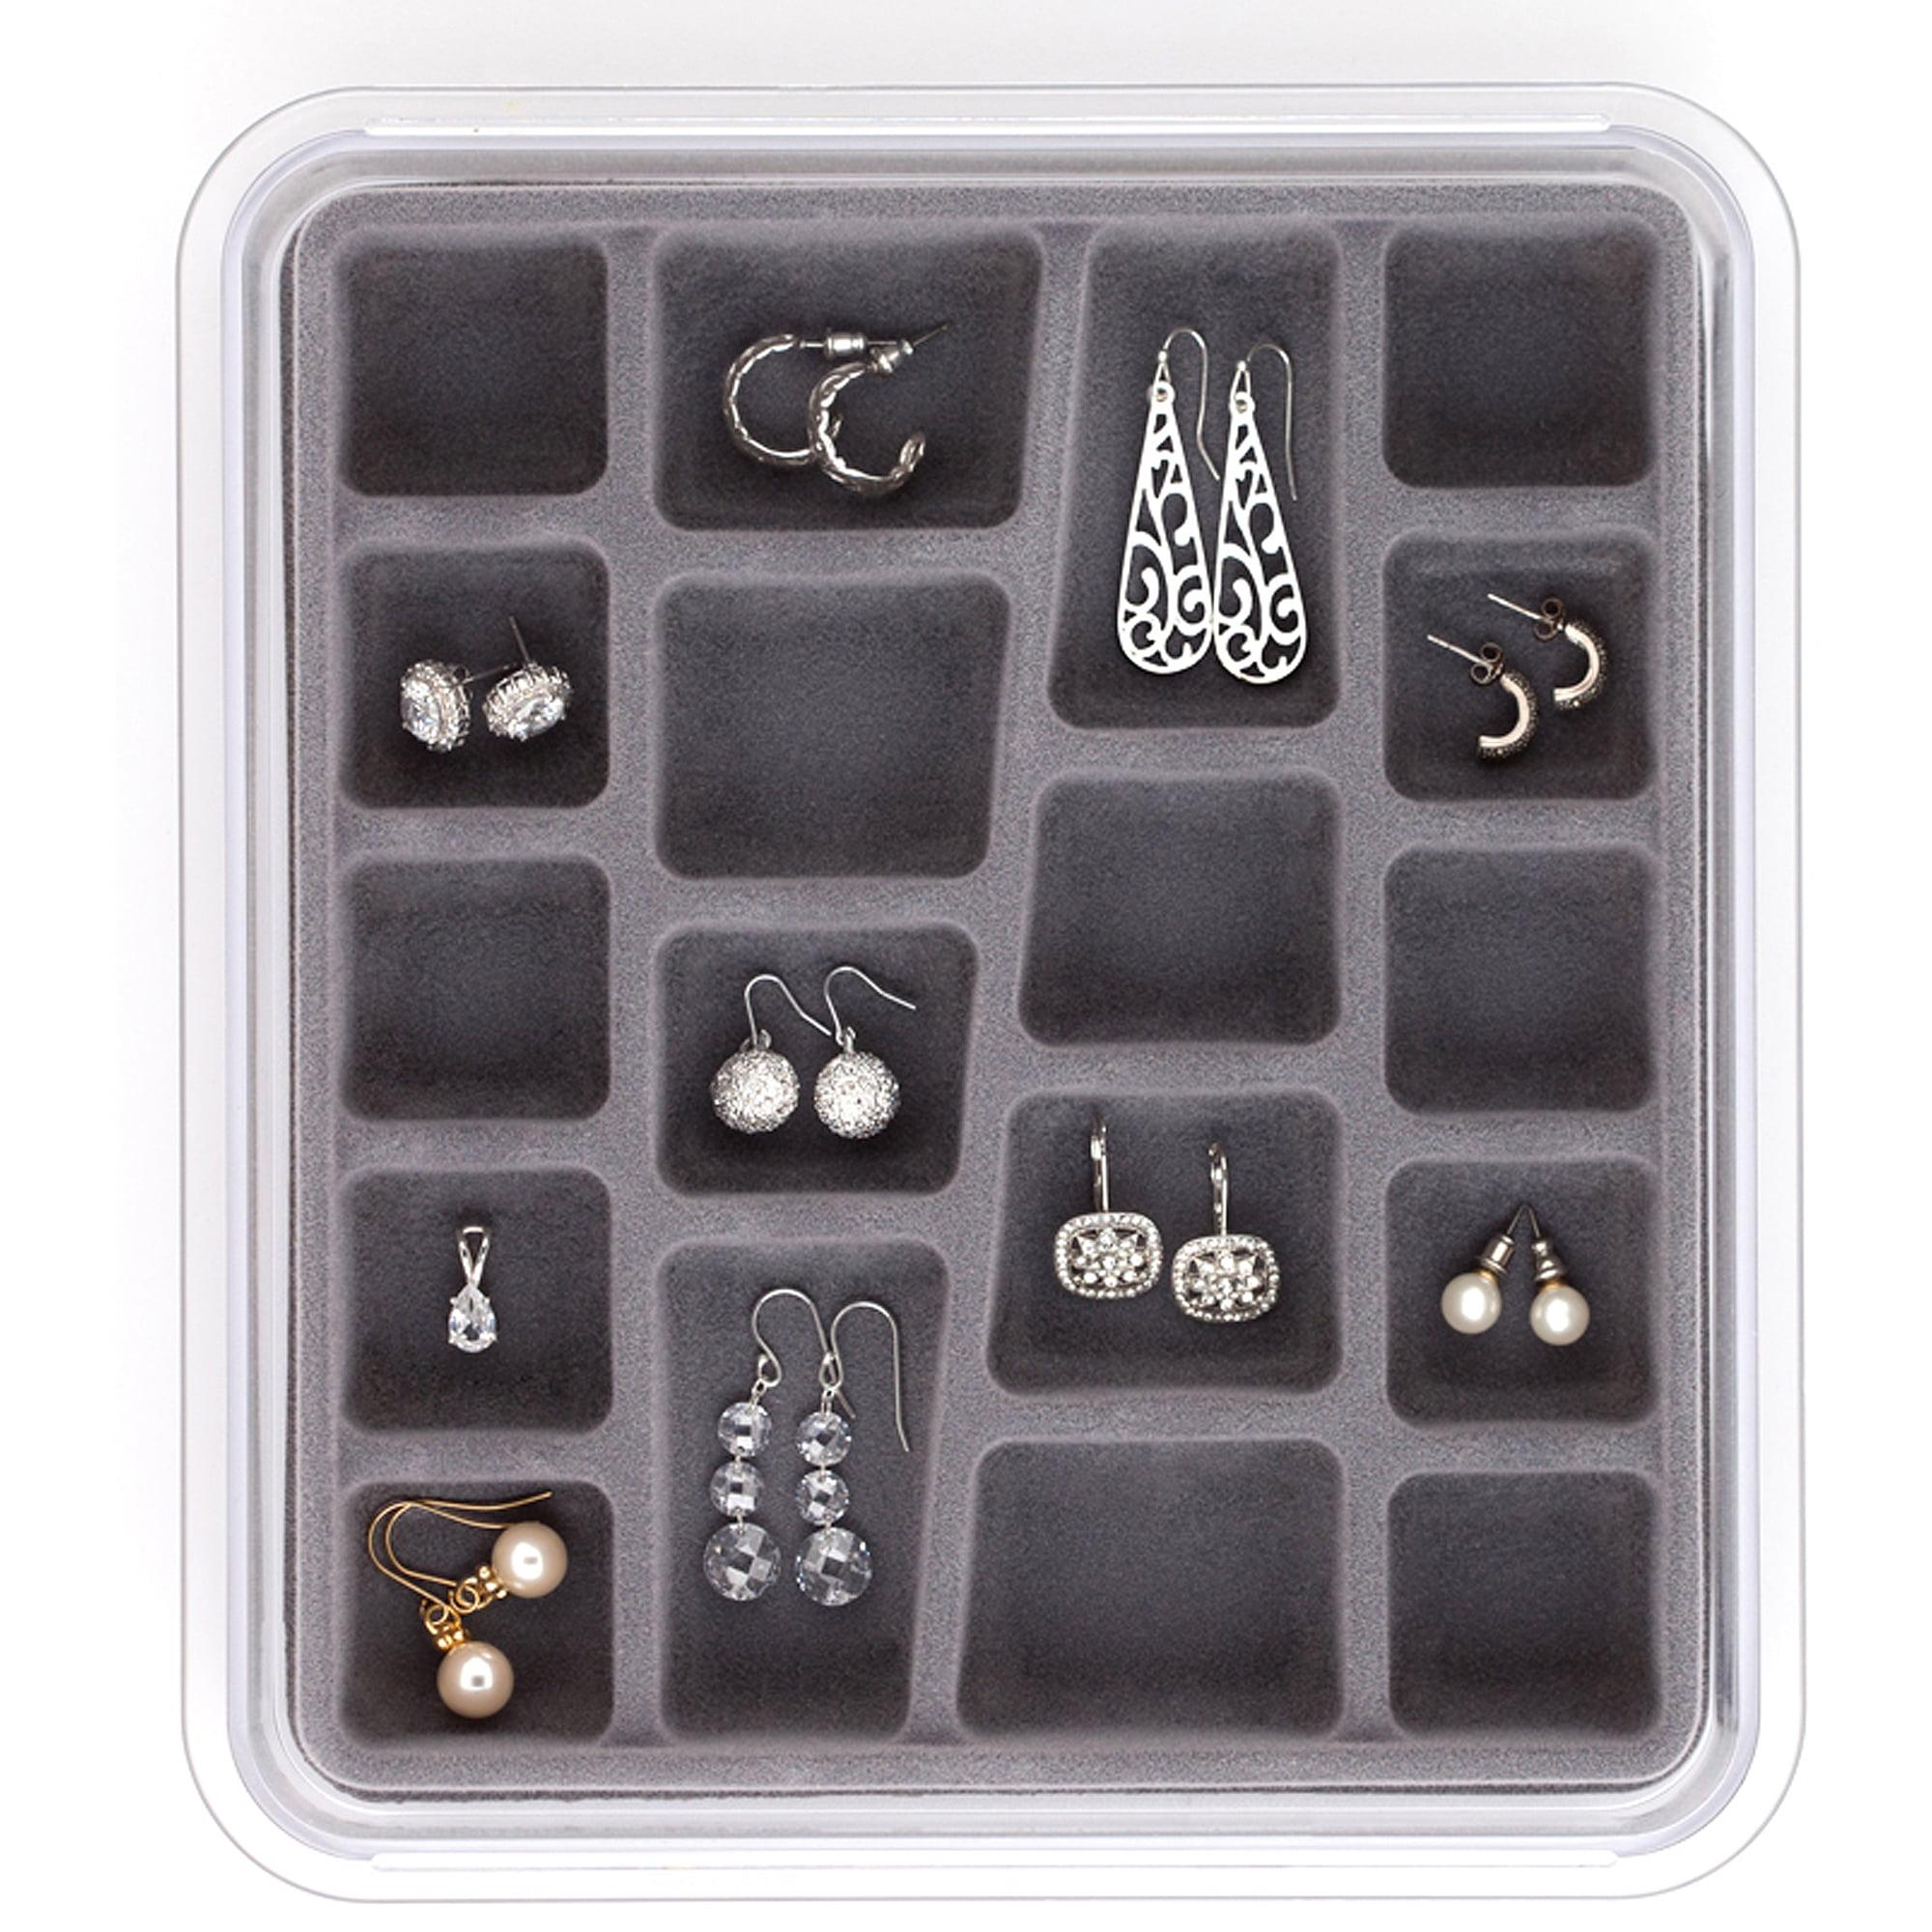 Neatnix Jewelry Stax Earring Organizer 18 Compartment